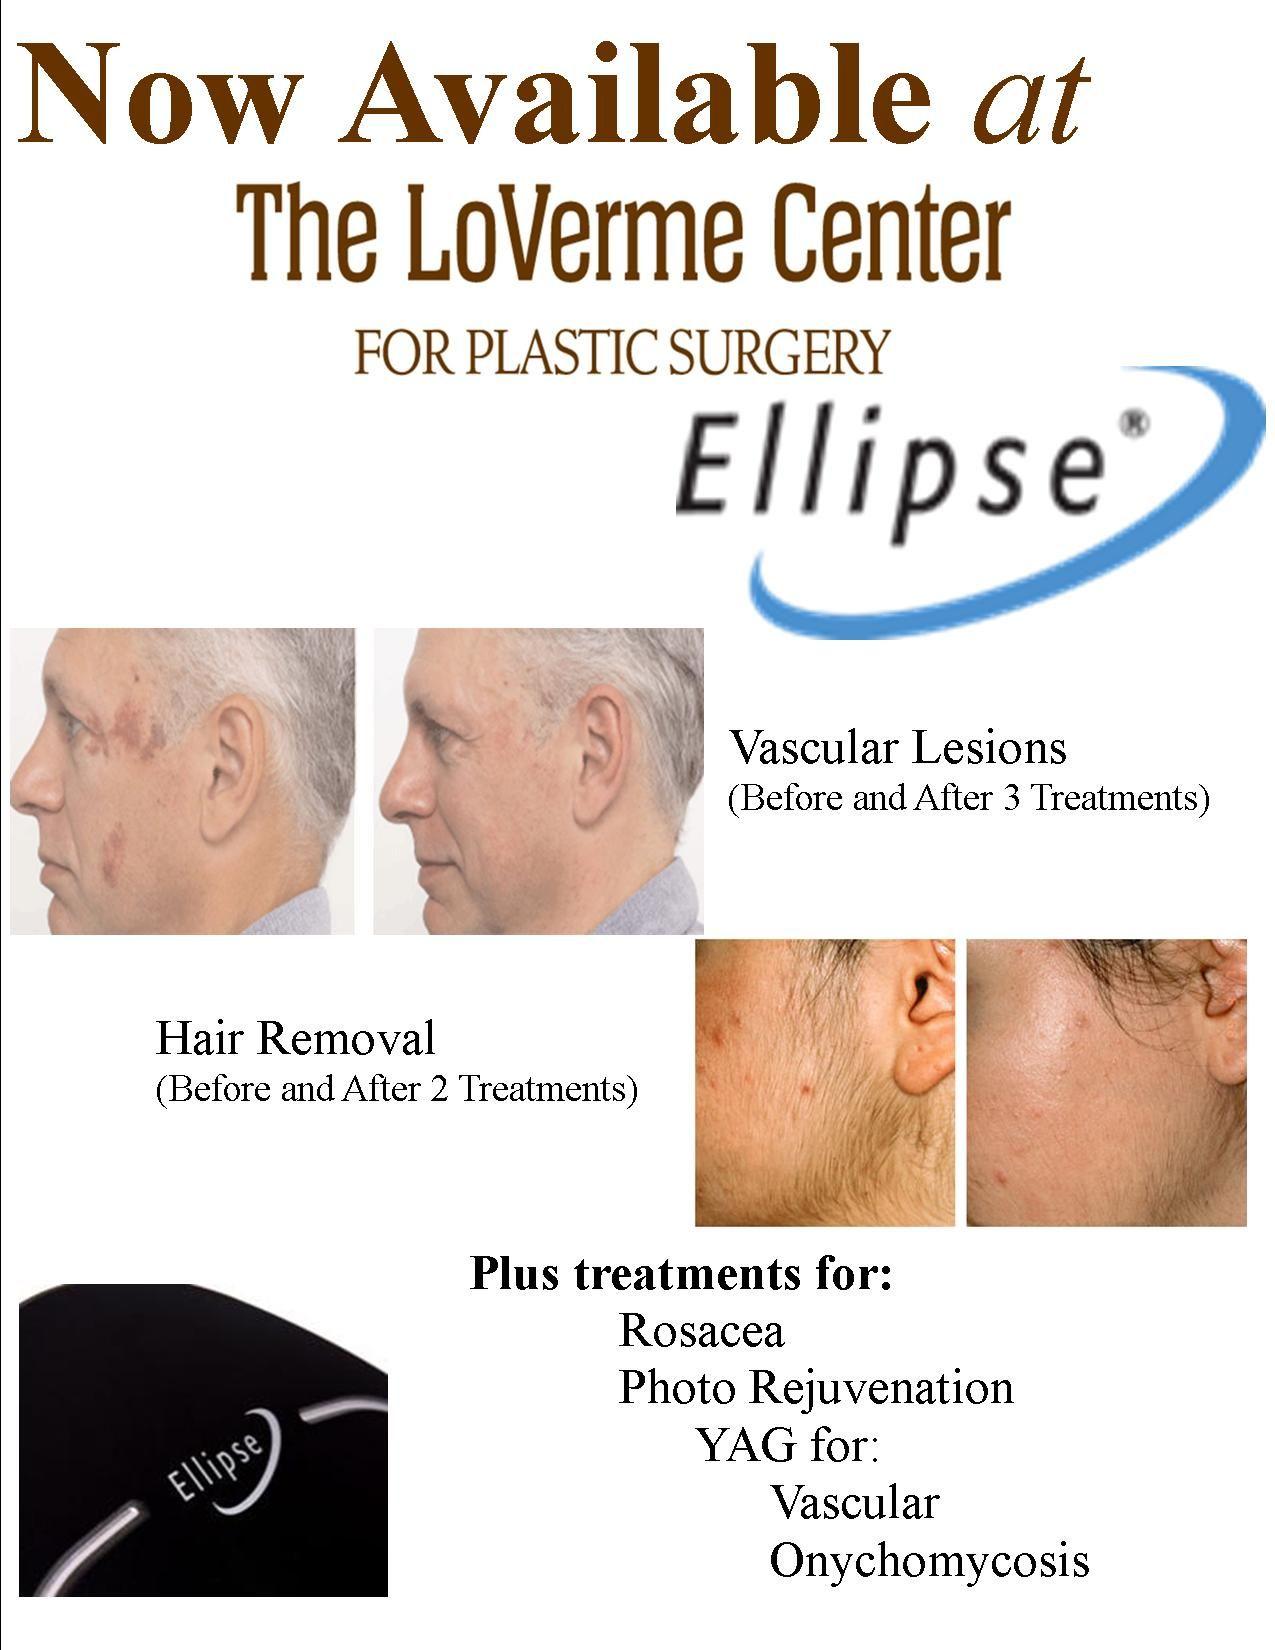 Ellipse  Ipl Now Available  Thelovermecenterforplasticsurgery Treatments Of  Hairrevoval